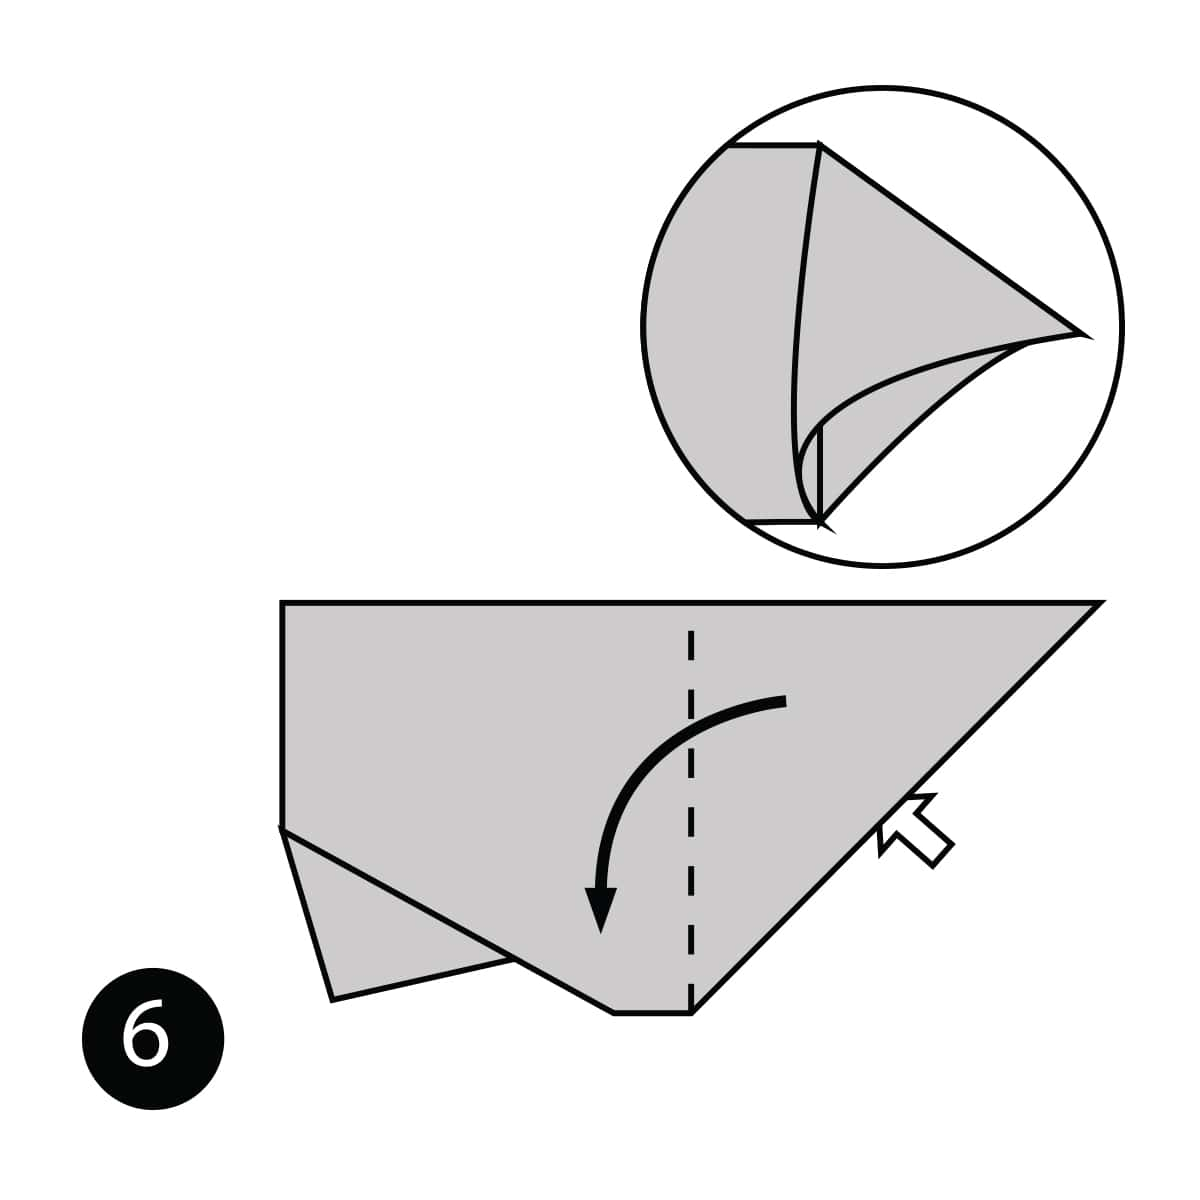 Rhino Step 6